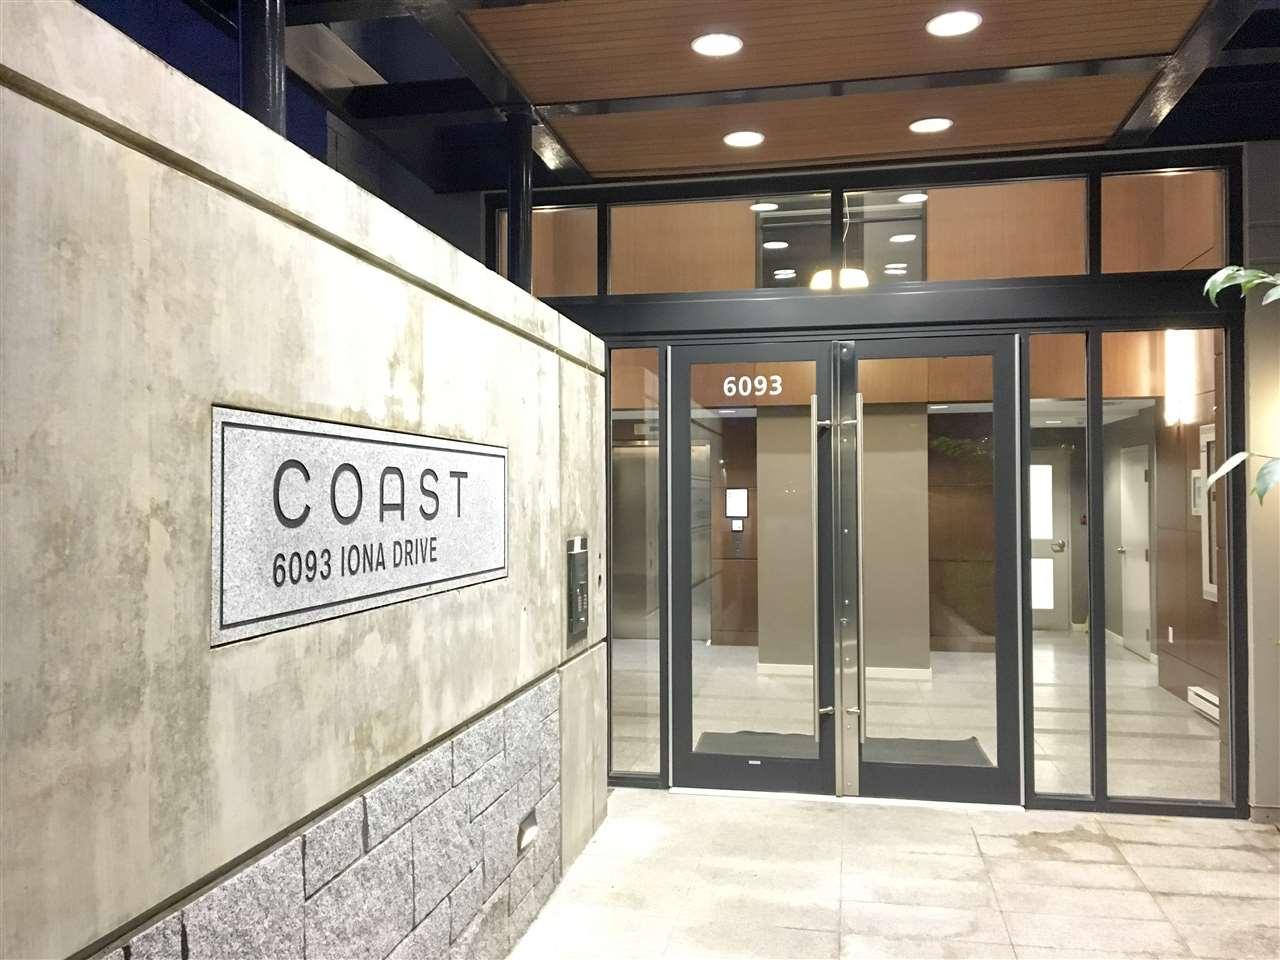 Condo Apartment at 303 6093 IONA DRIVE, Unit 303, Vancouver West, British Columbia. Image 1